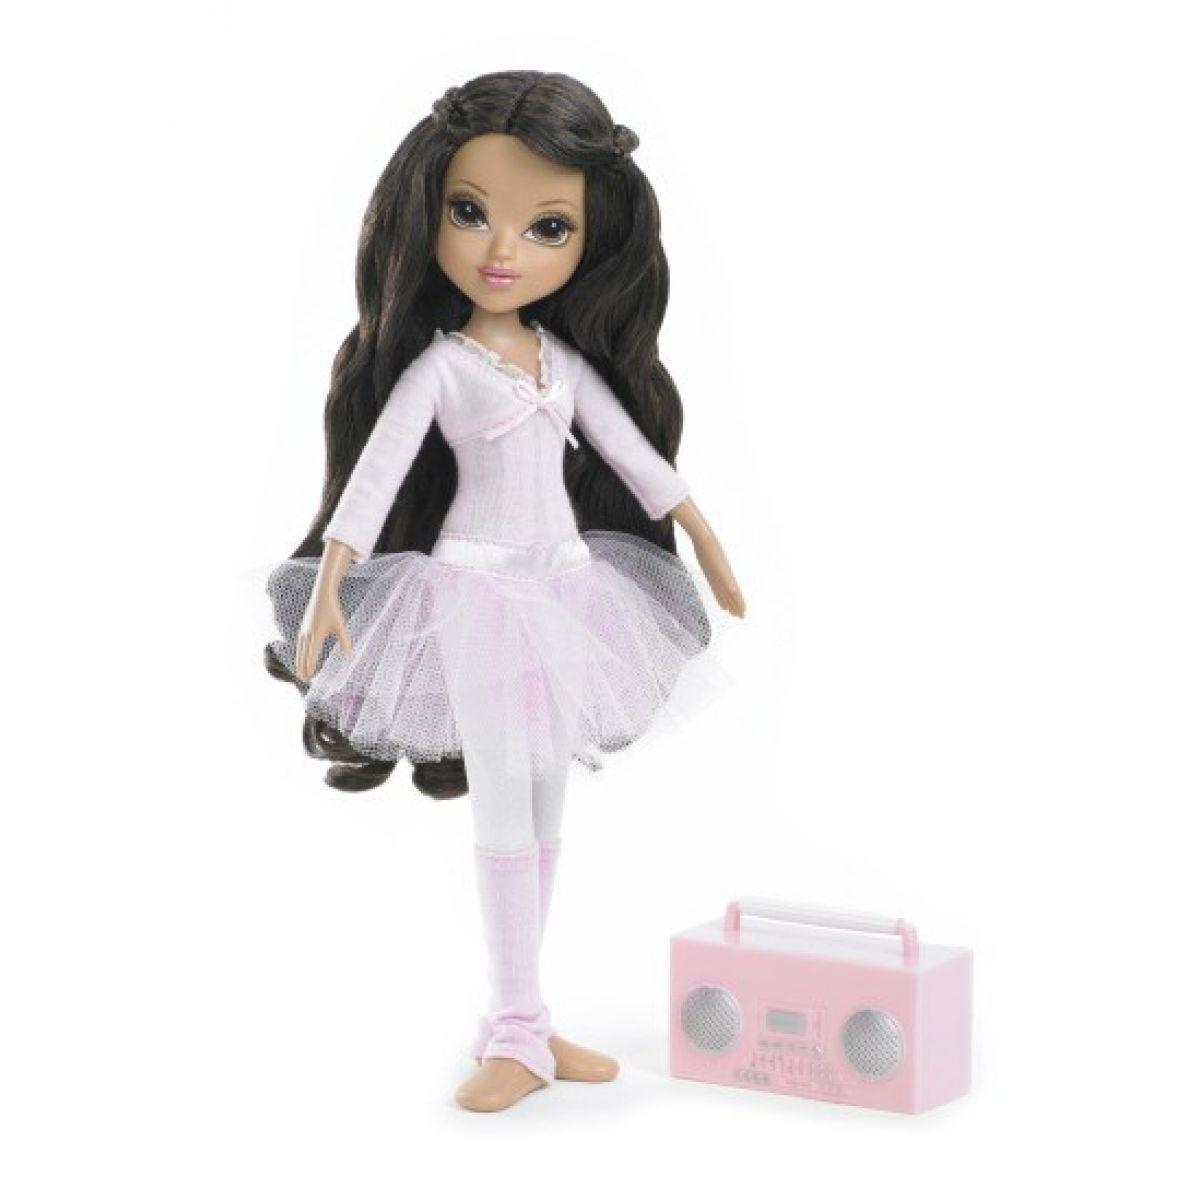 Moxie Girlz Panenka After School - Sophina